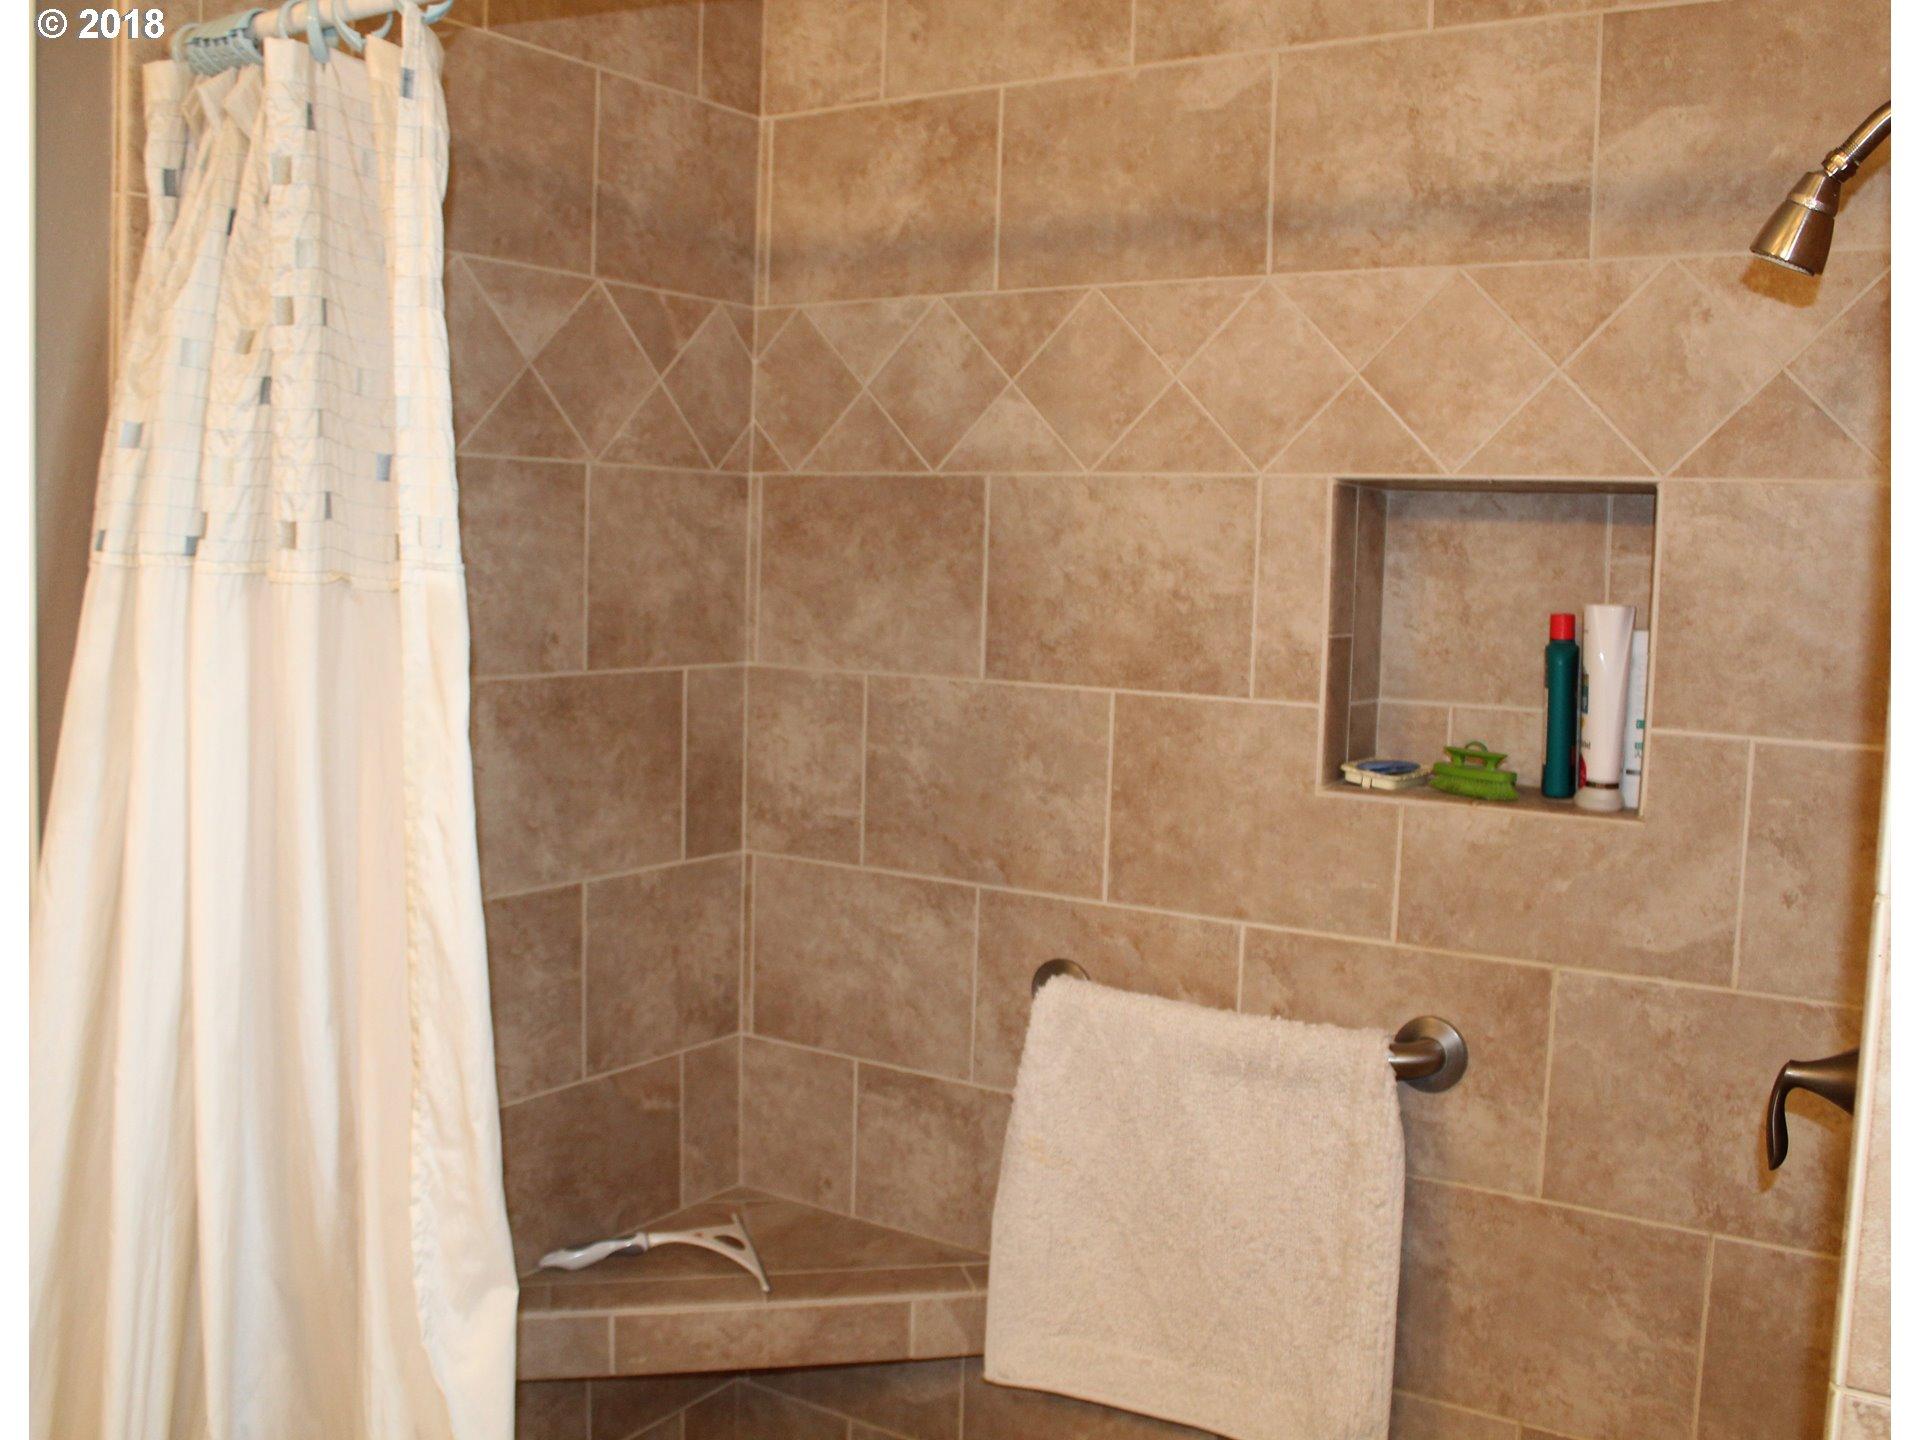 http://photos.rmlsweb.com/webphotos/18100000/80000/2000/18182361-4.jpg